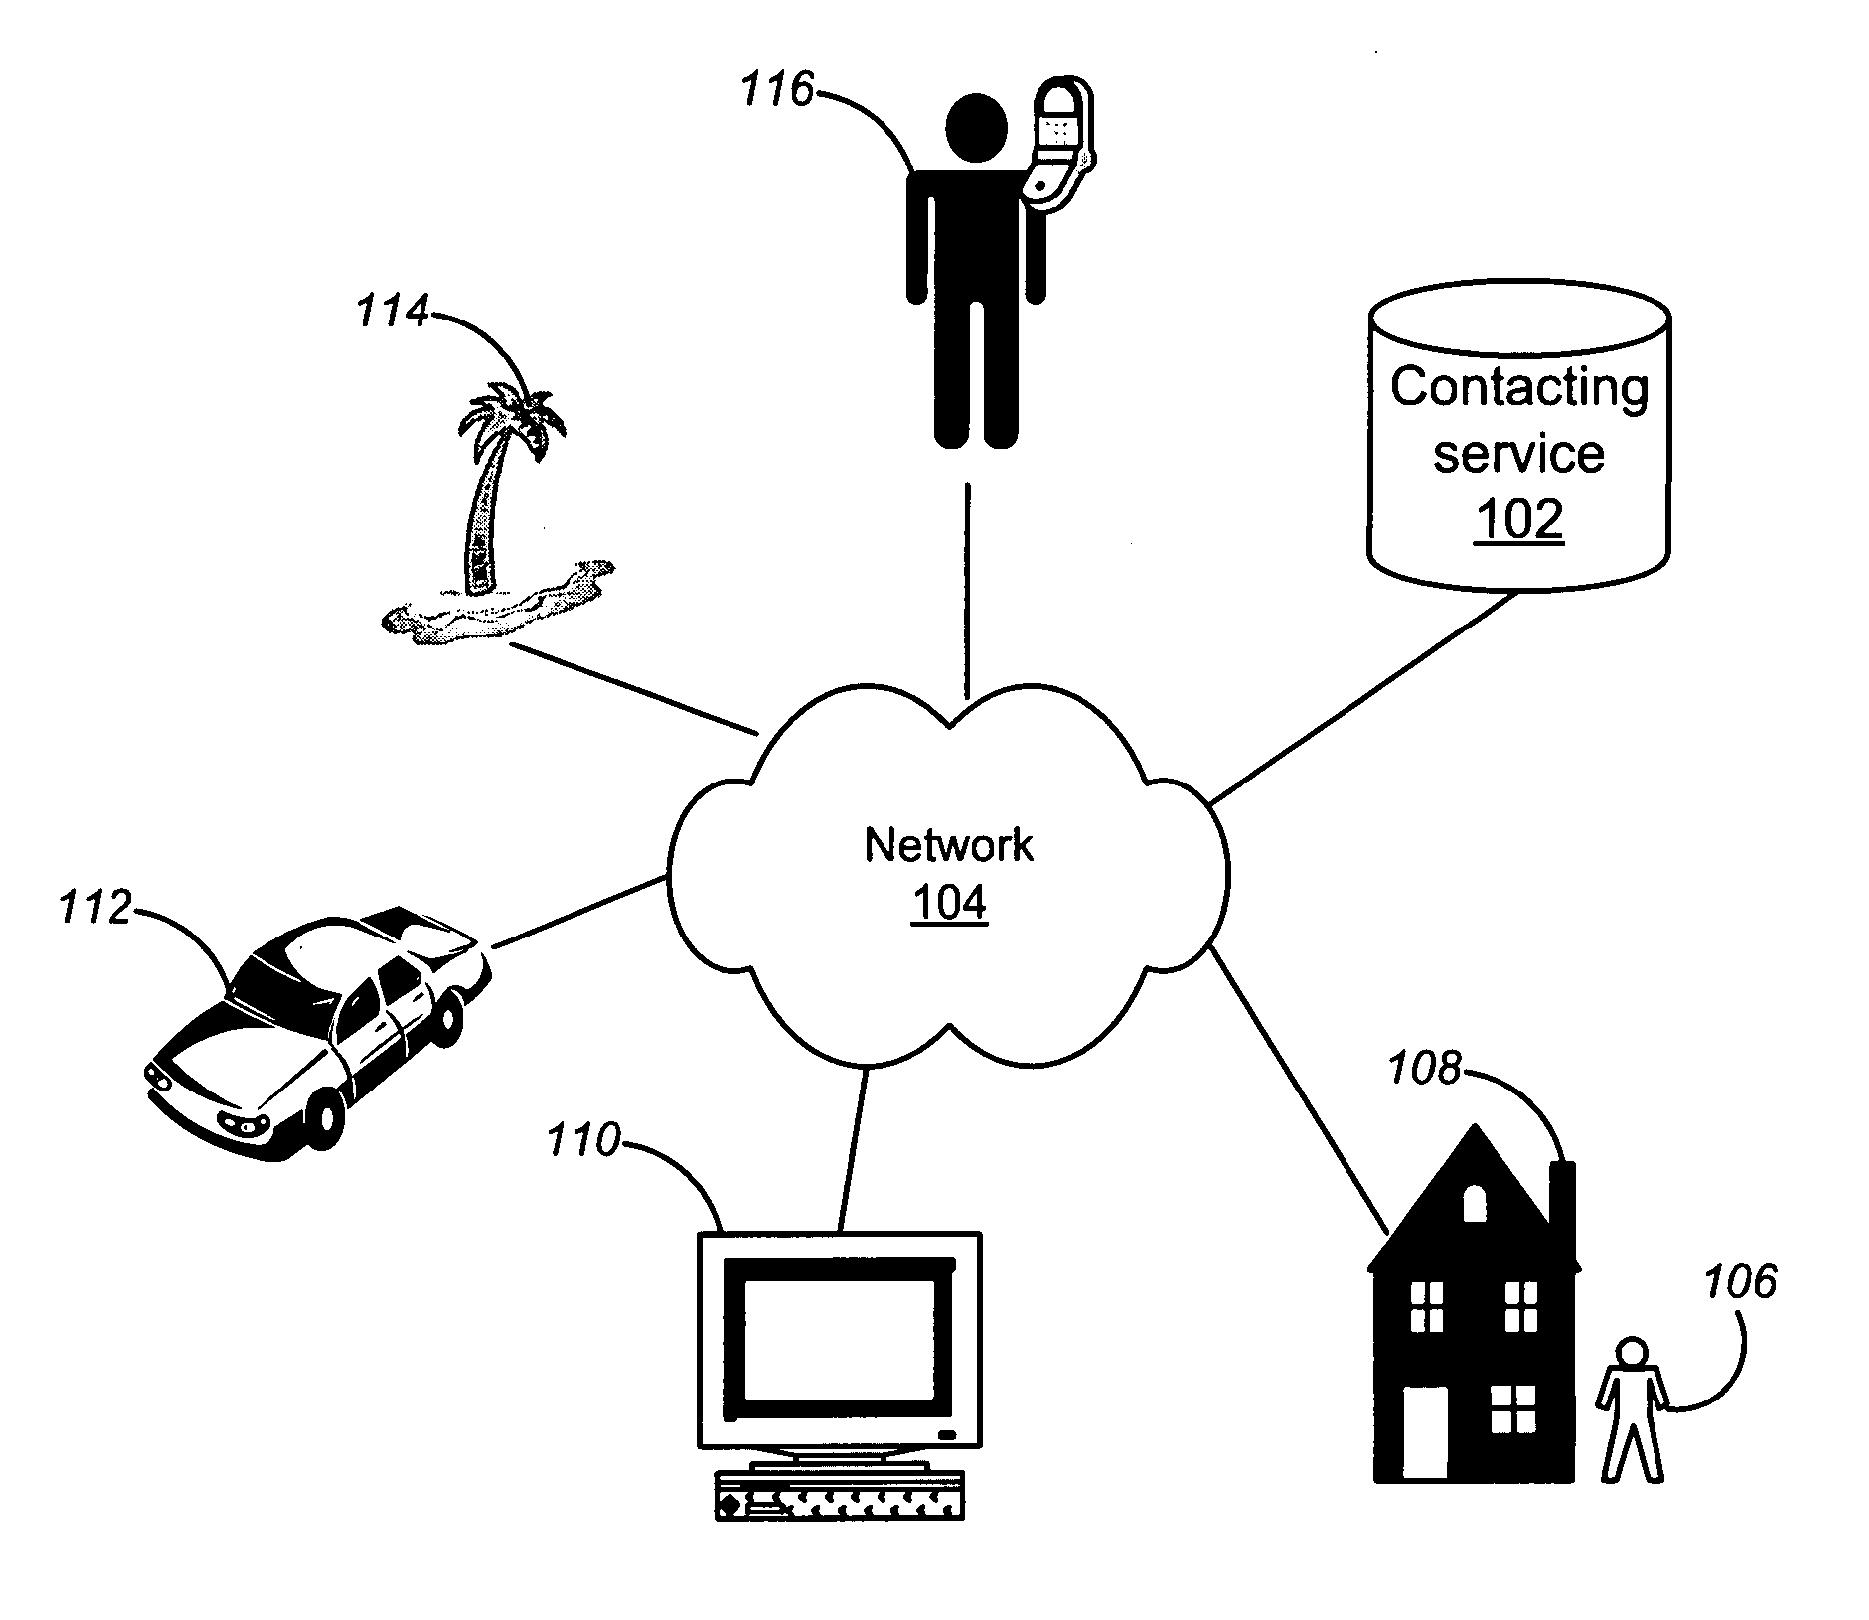 Apple patent 8433805 (drawing 004)